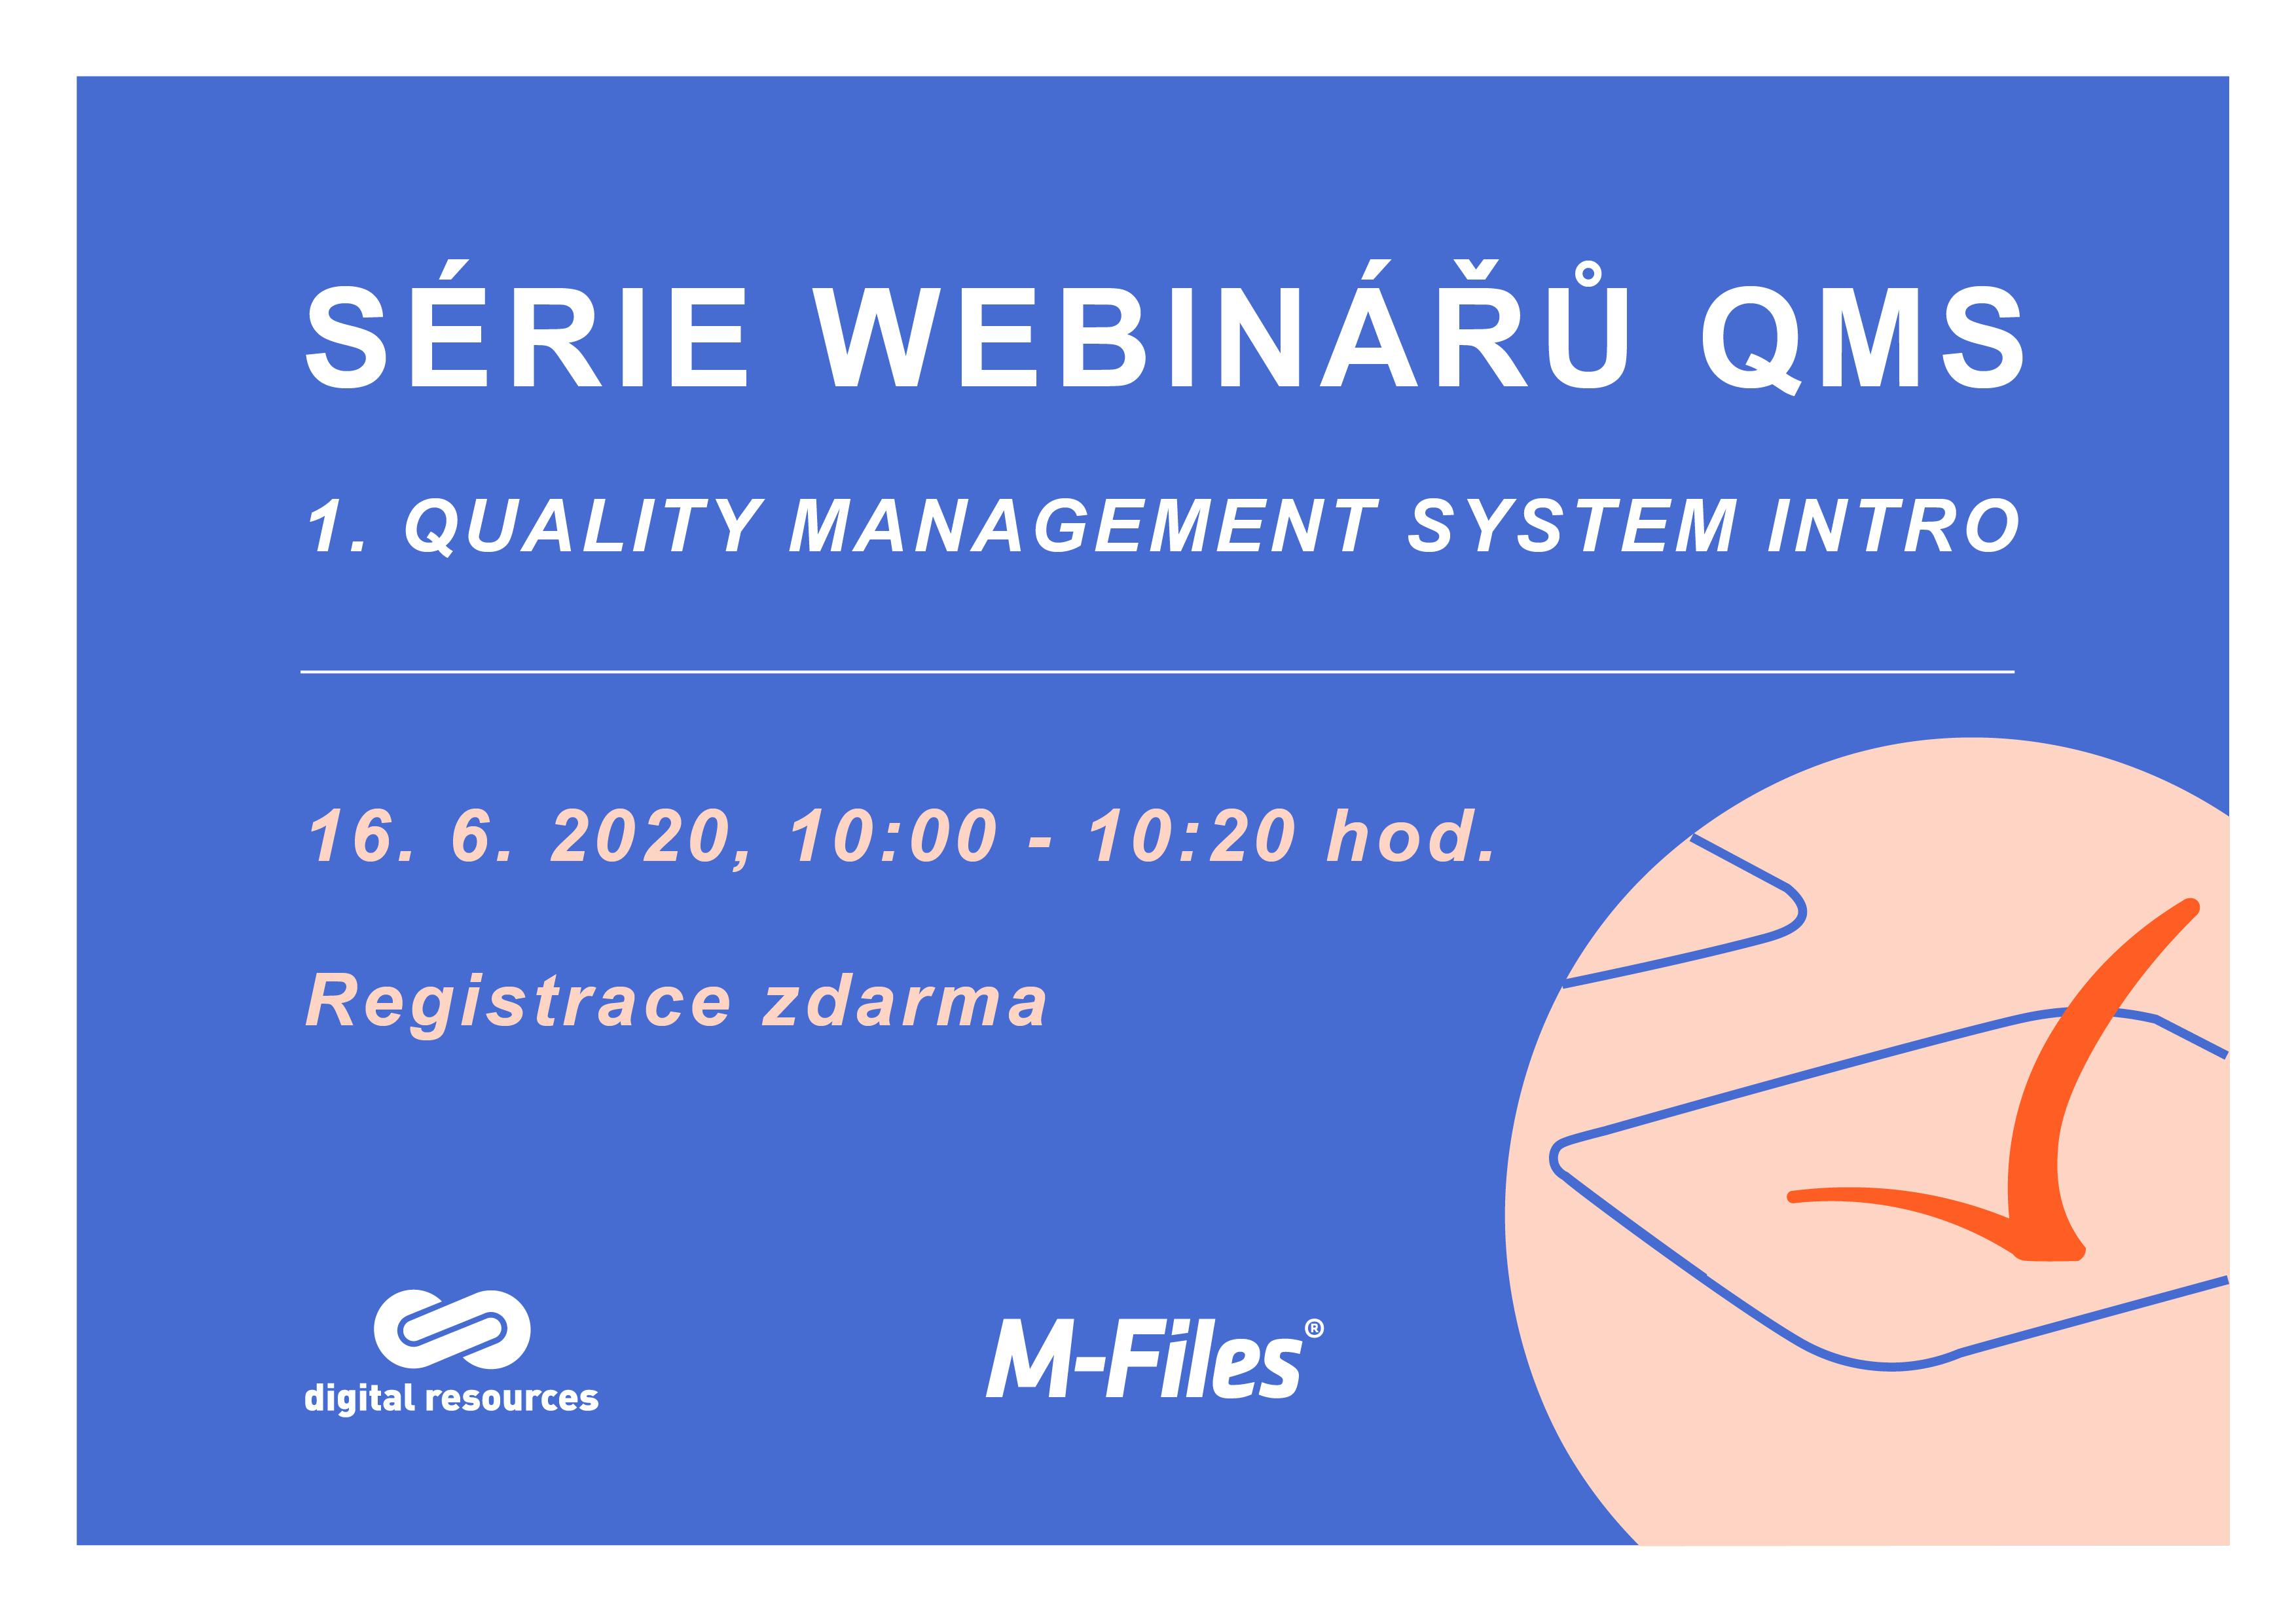 Webinar QMS 16. 6. 2020